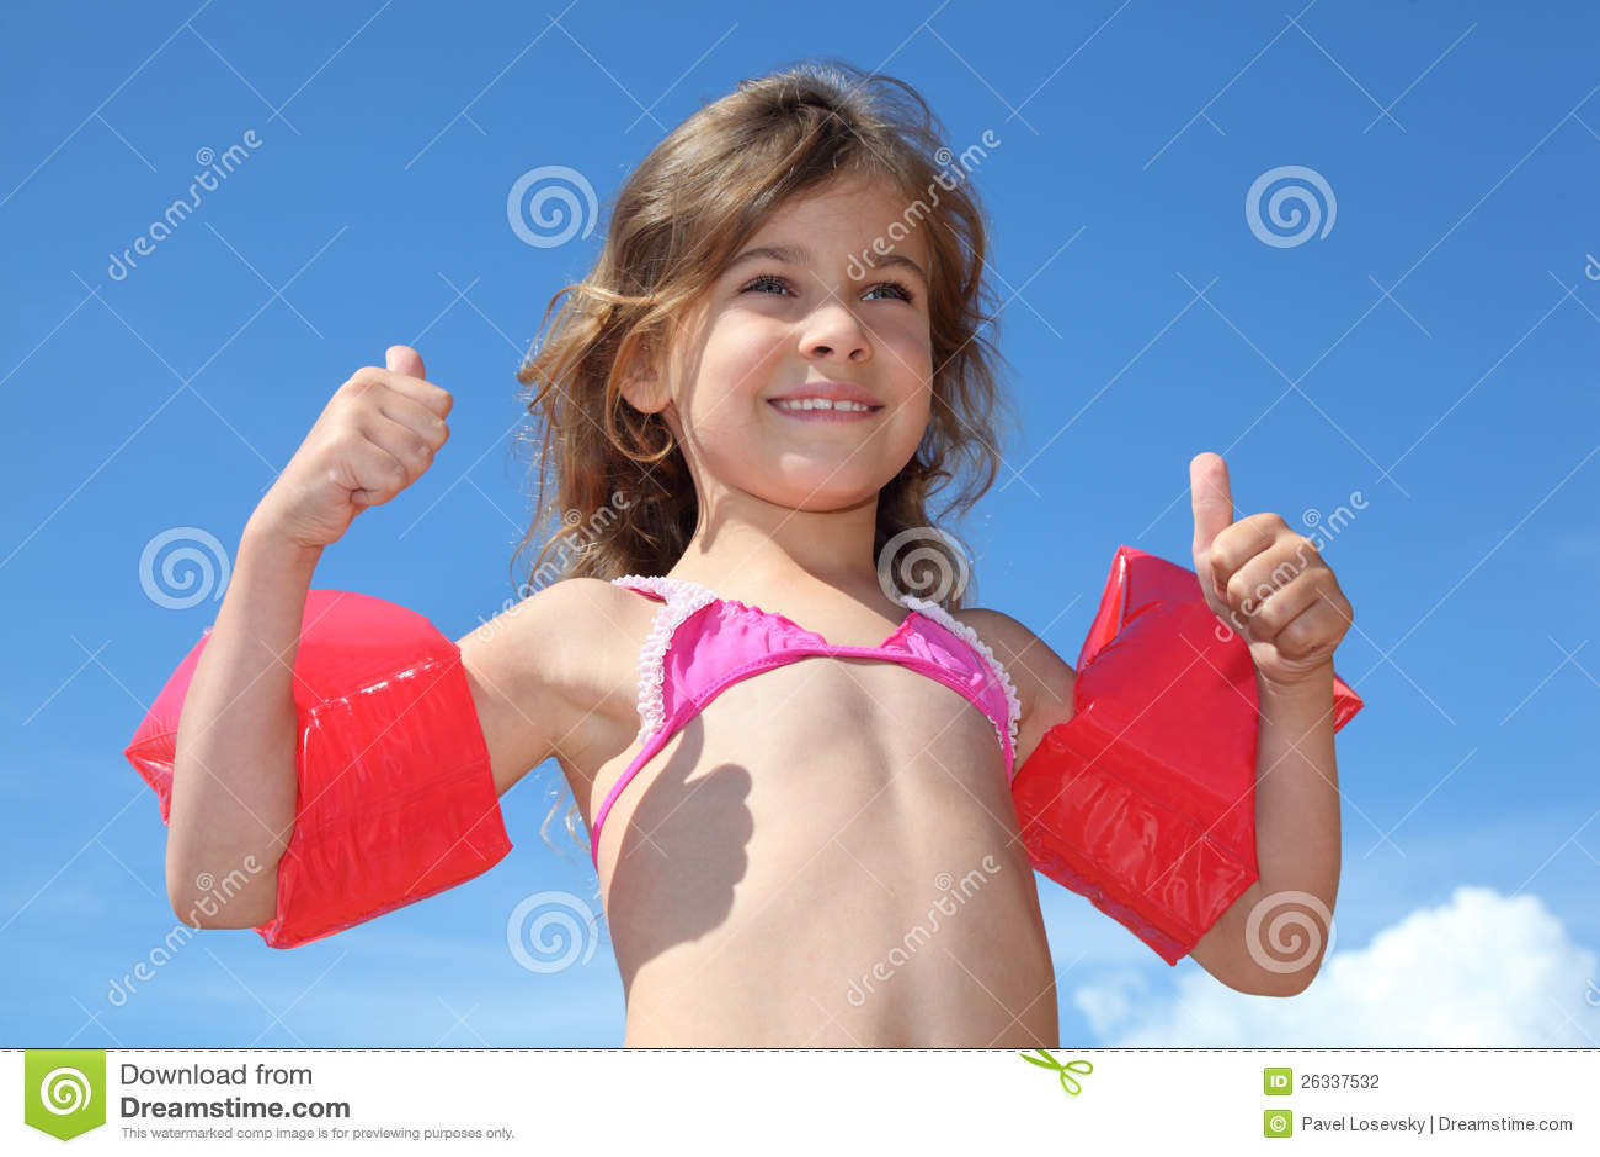 Inflatable Armbands Stock Photo - Image: 58125376